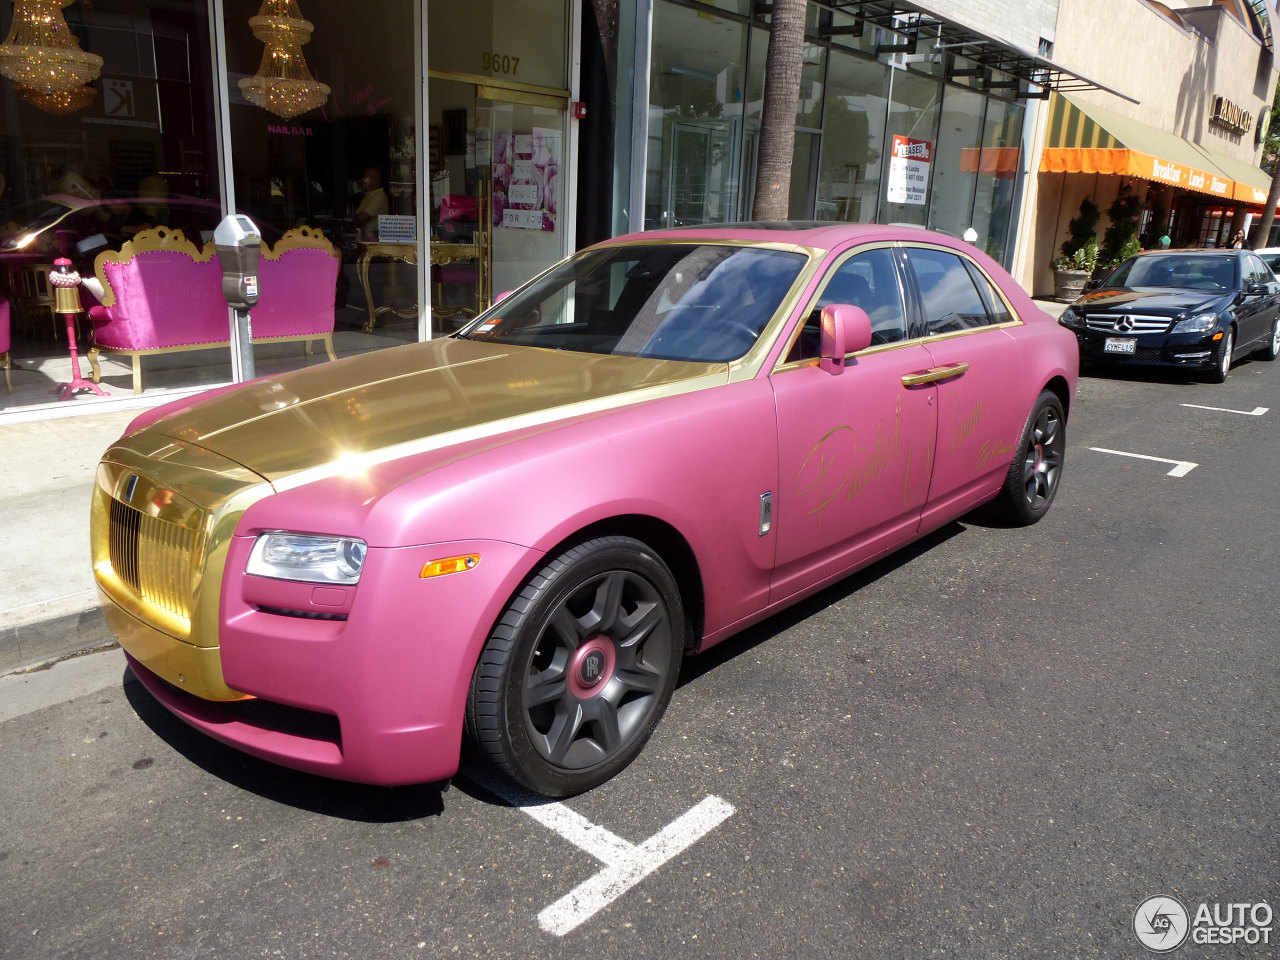 Rolls-Royce Ghost - 2 October 2014 - Autogespot